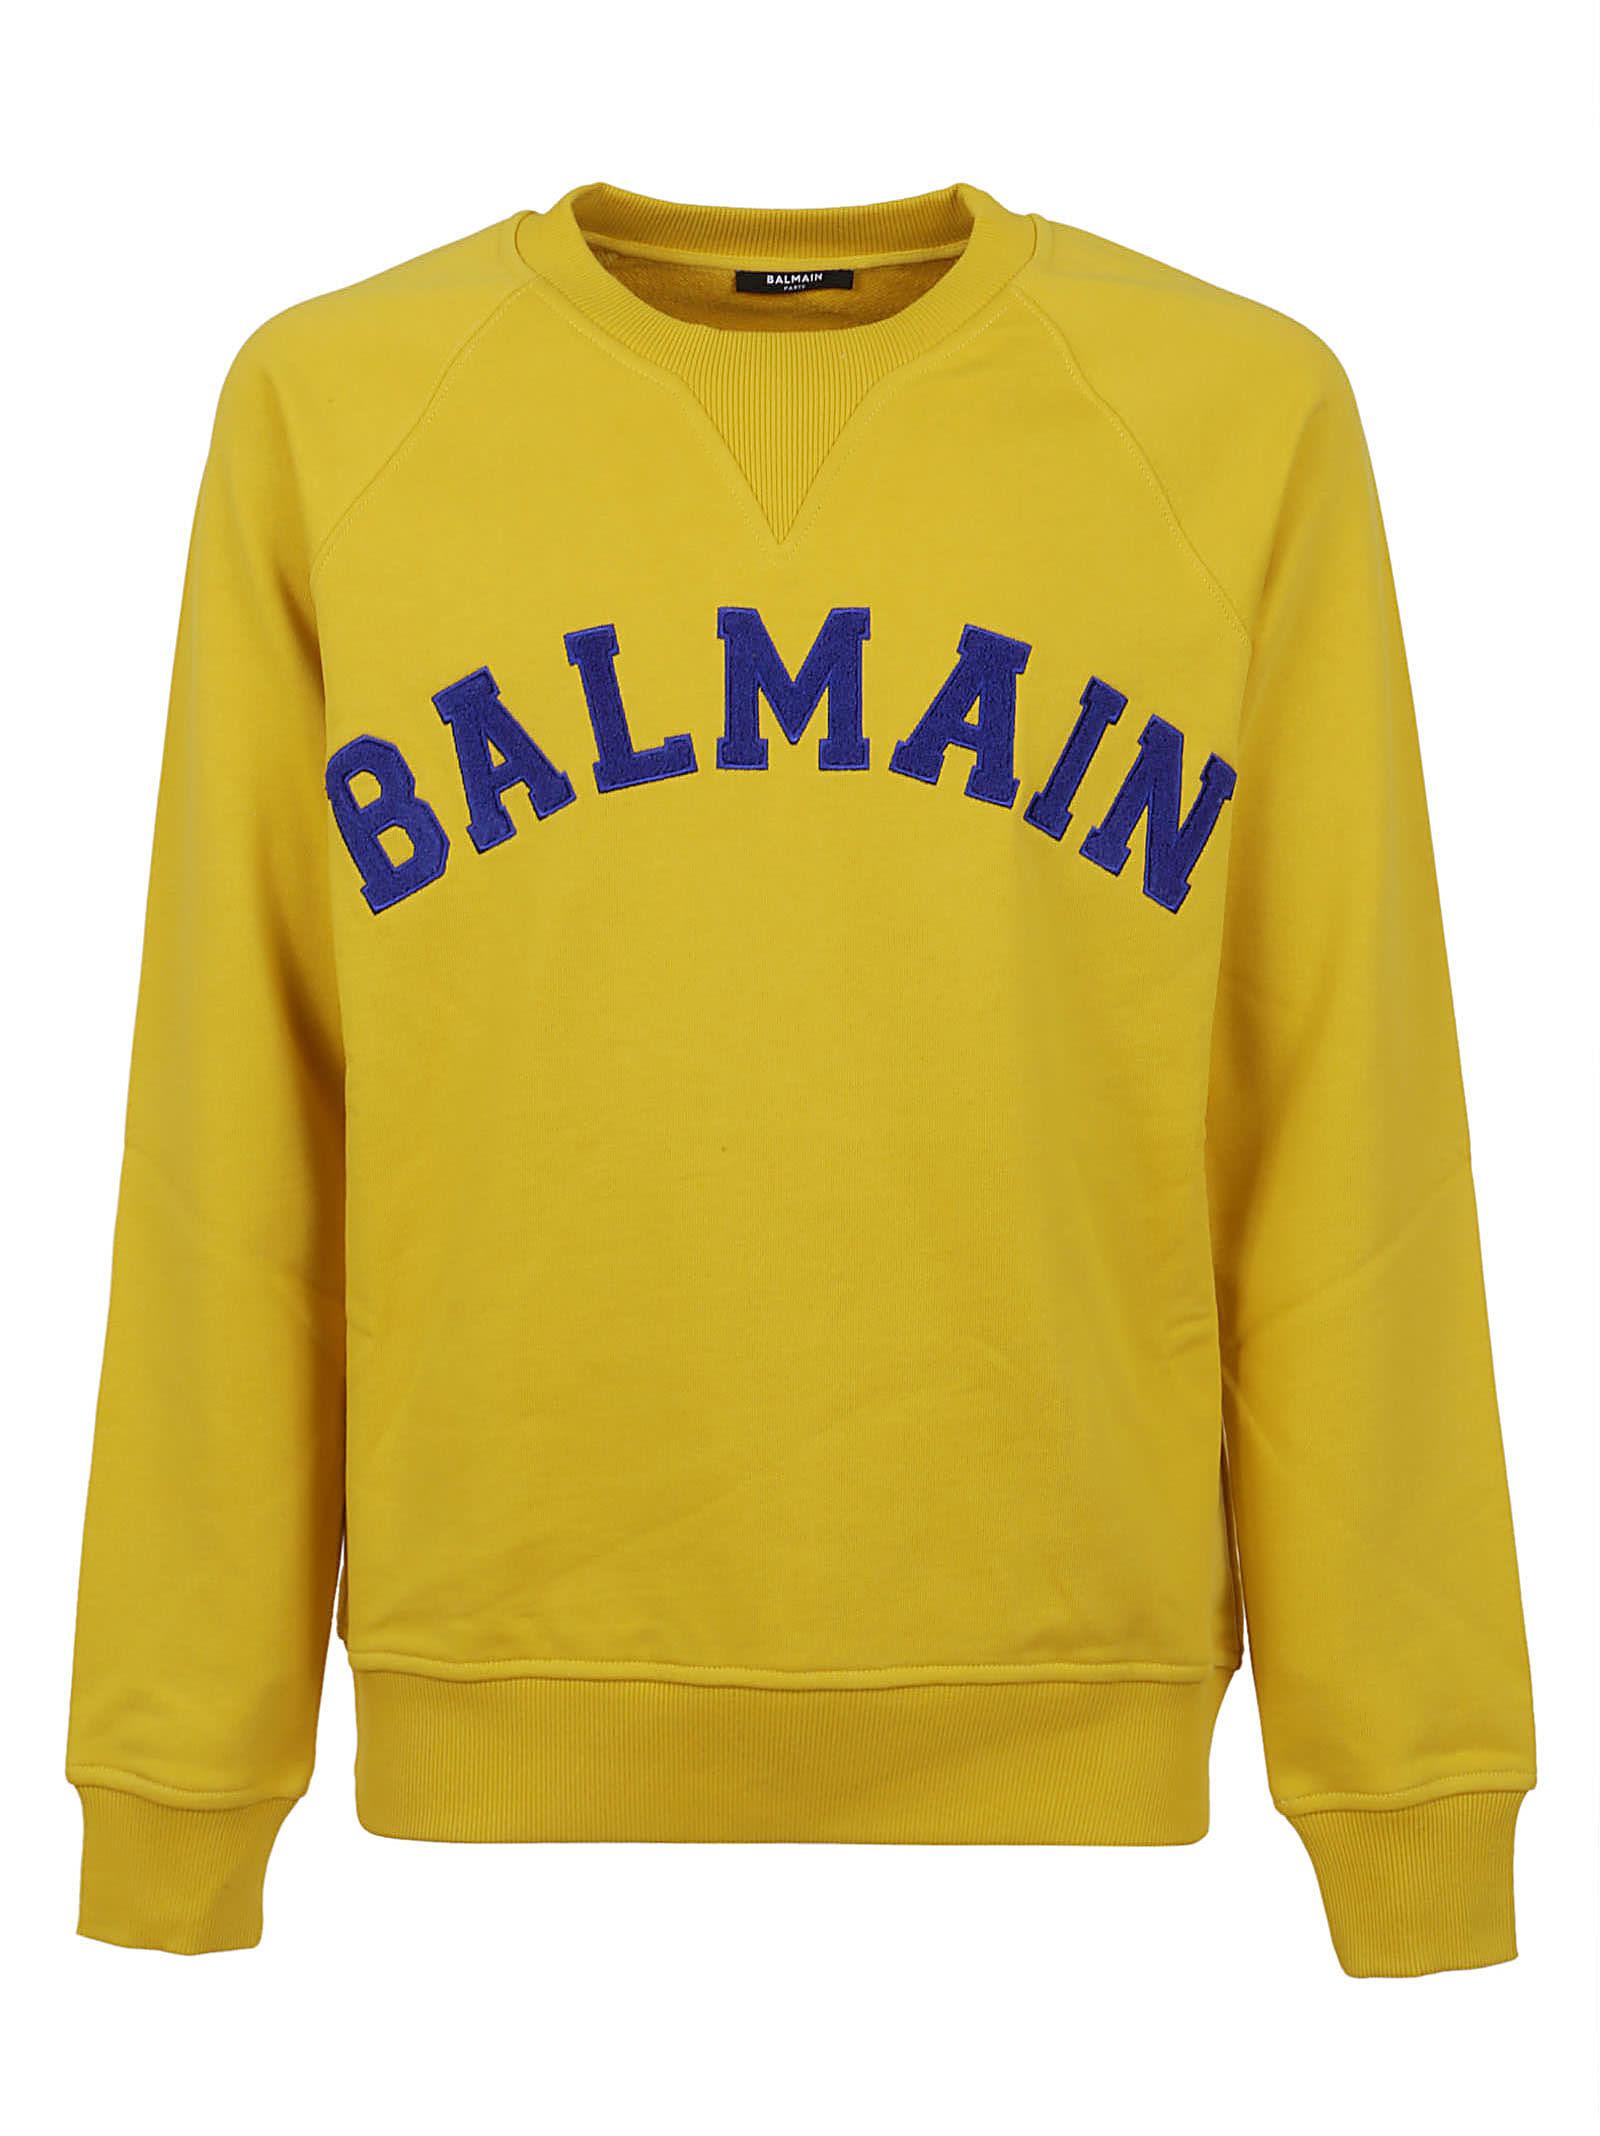 Balmain College Sweatshirt